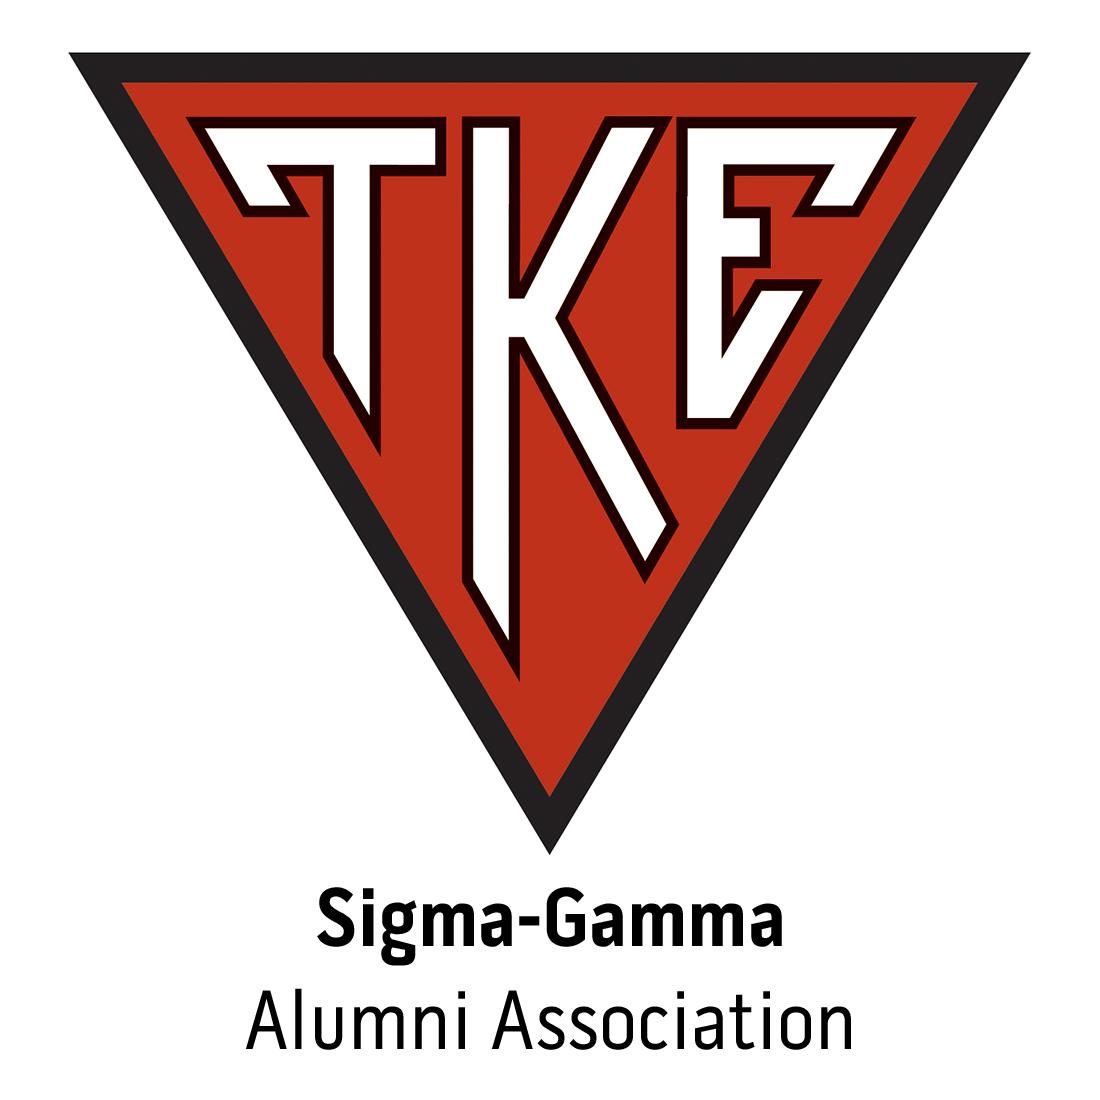 Sigma-Gamma Alumni Association for State University of New York at Plattsburgh